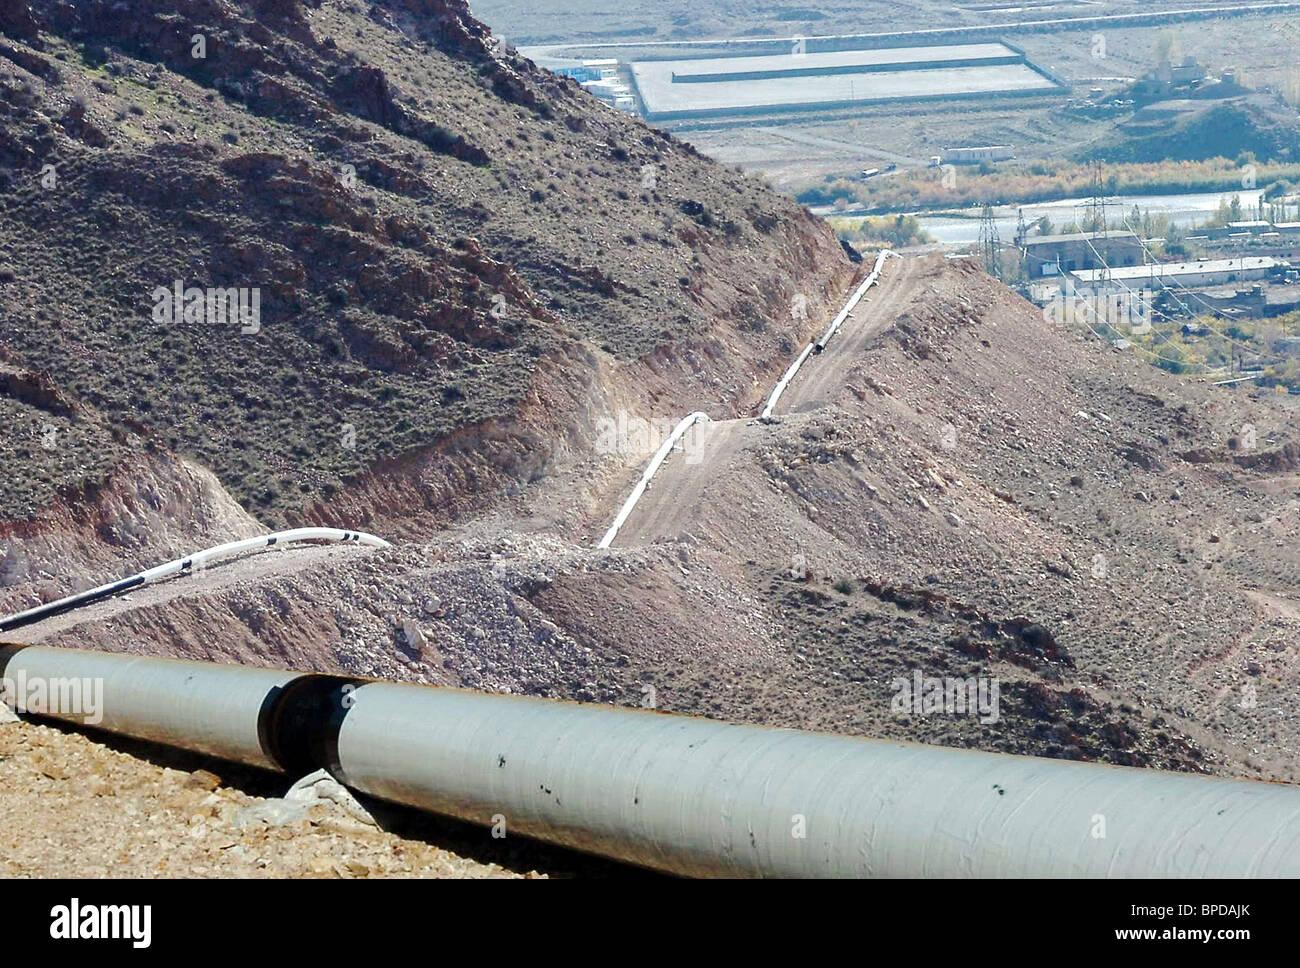 Iran-Armenia cross-border gas pipeline opens - Stock Image